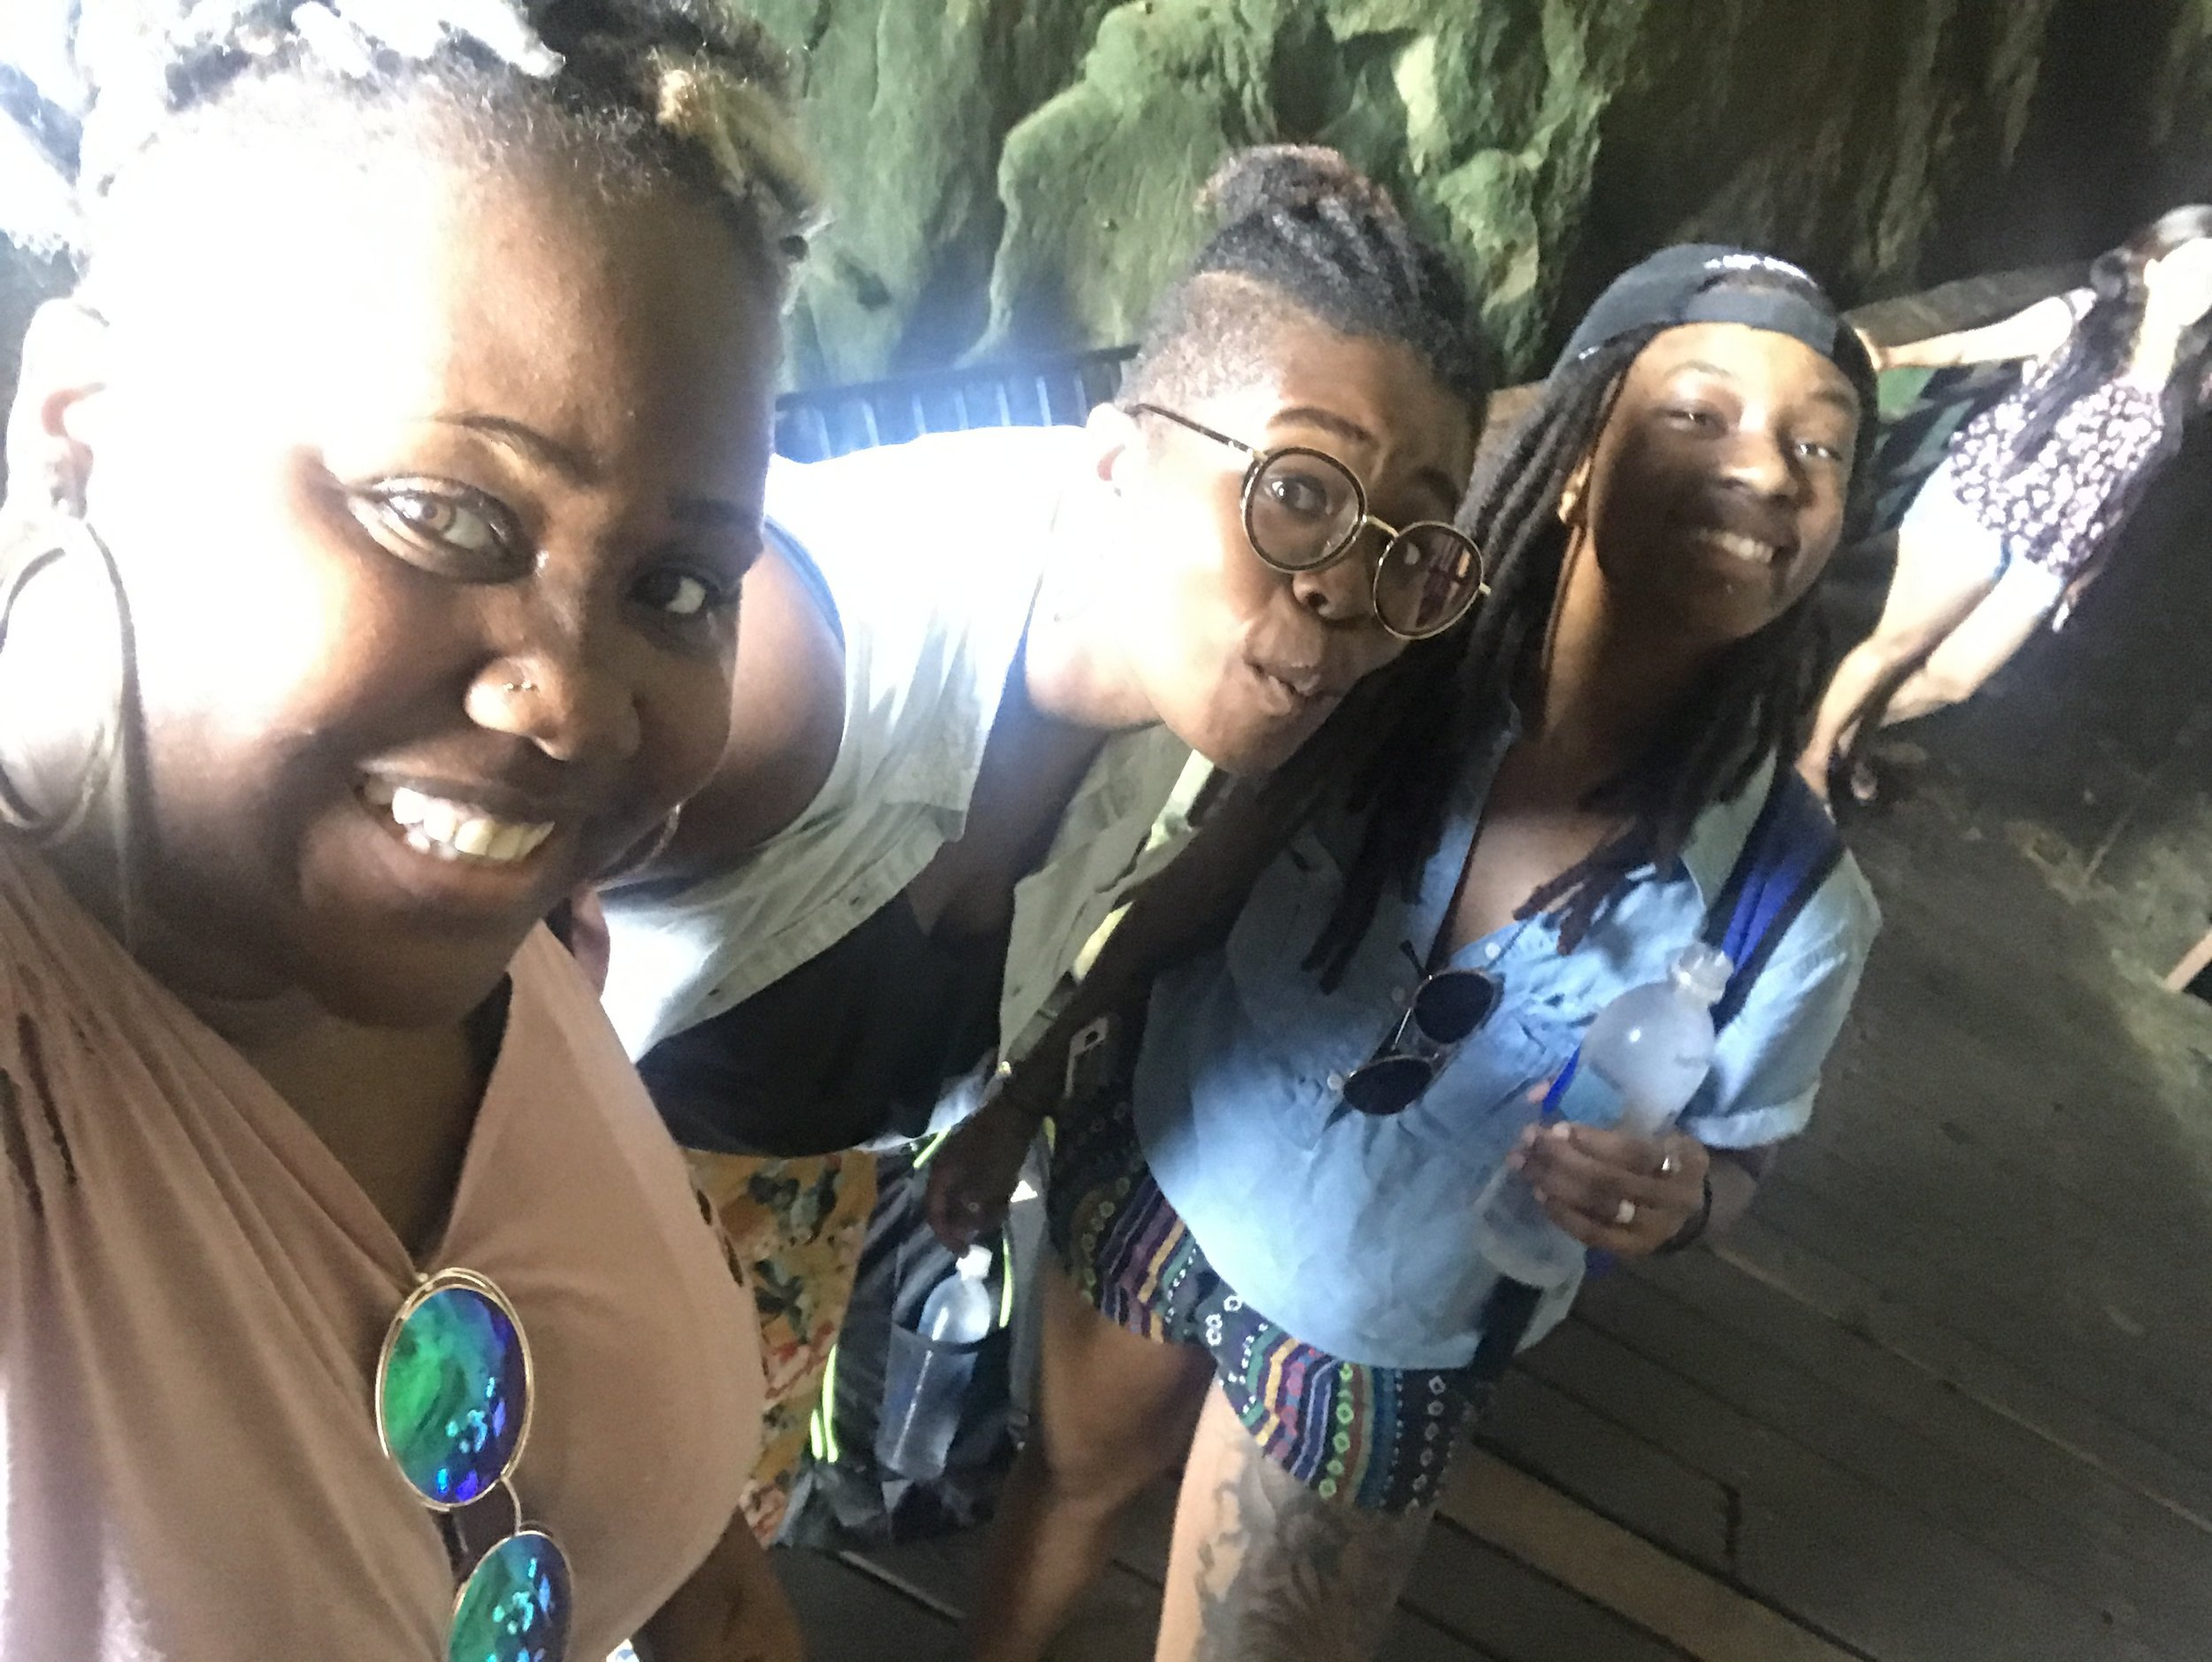 Me, Taneisha, and Morgan in Jim's Cave